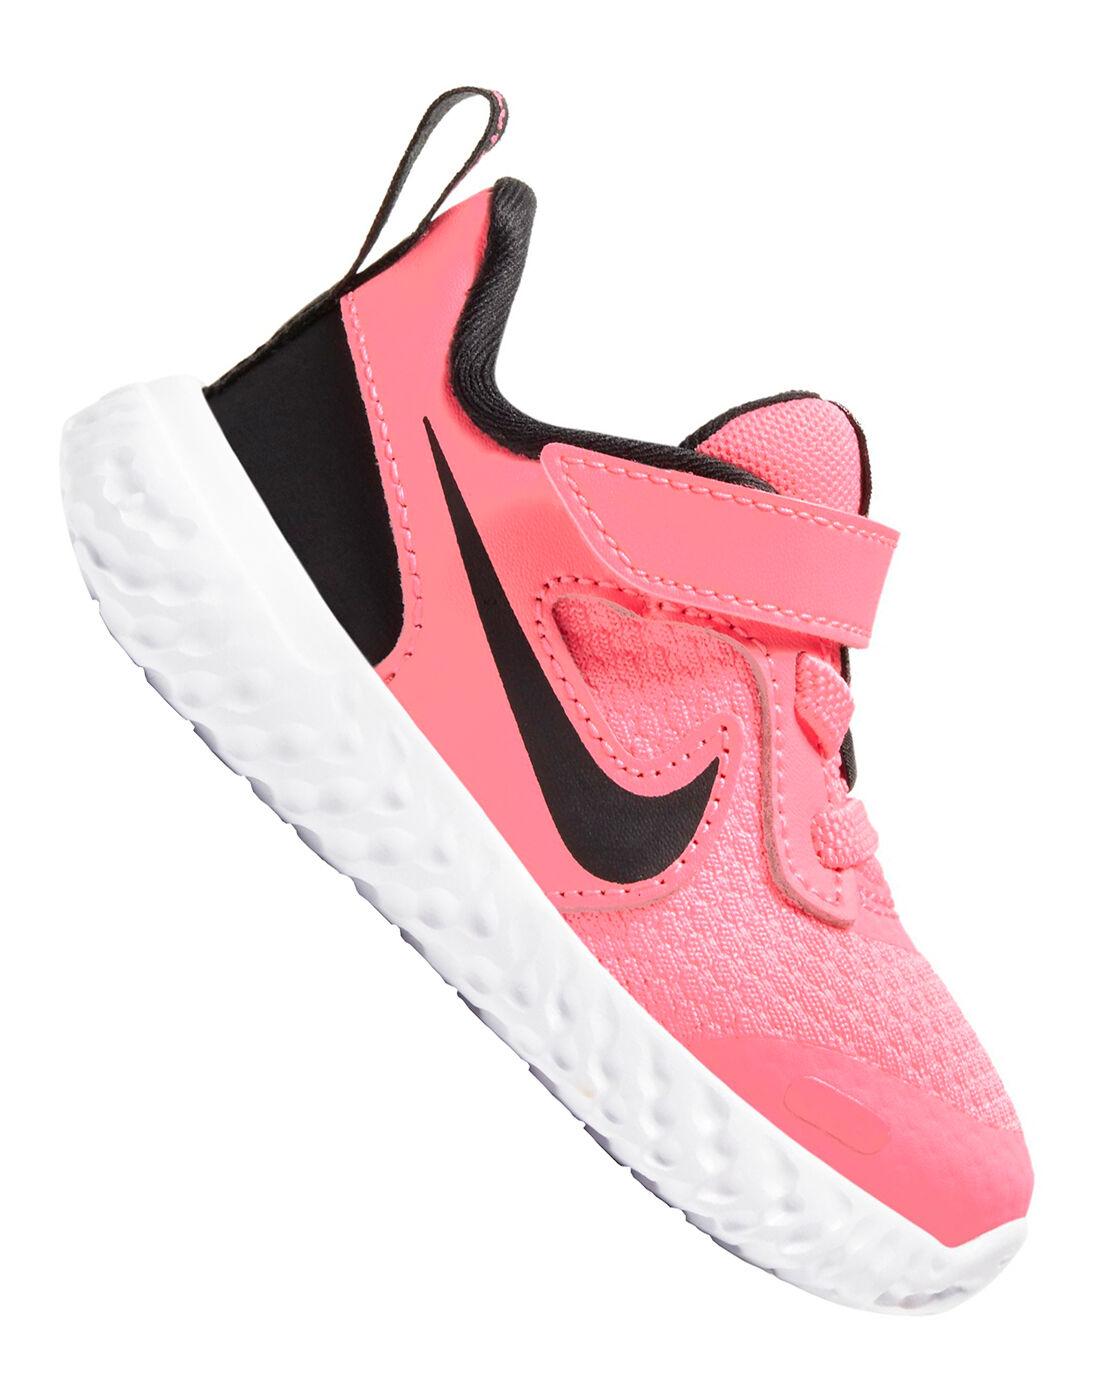 Nike adidas x_plr thailand women names and boys   Infants Revolution